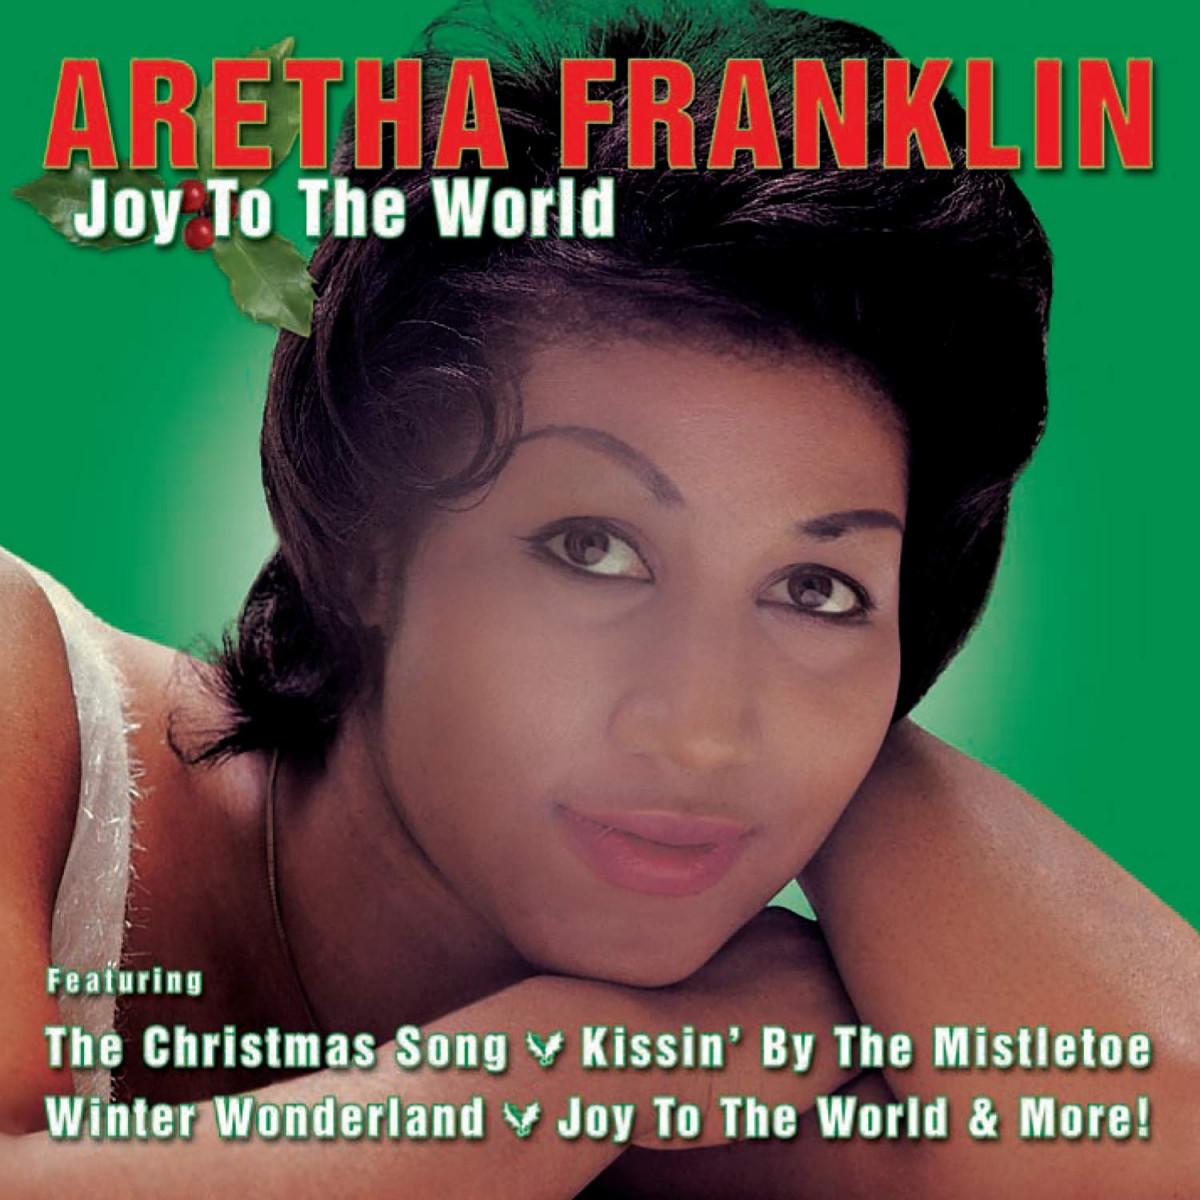 Aretha Franklin - Joy to the world